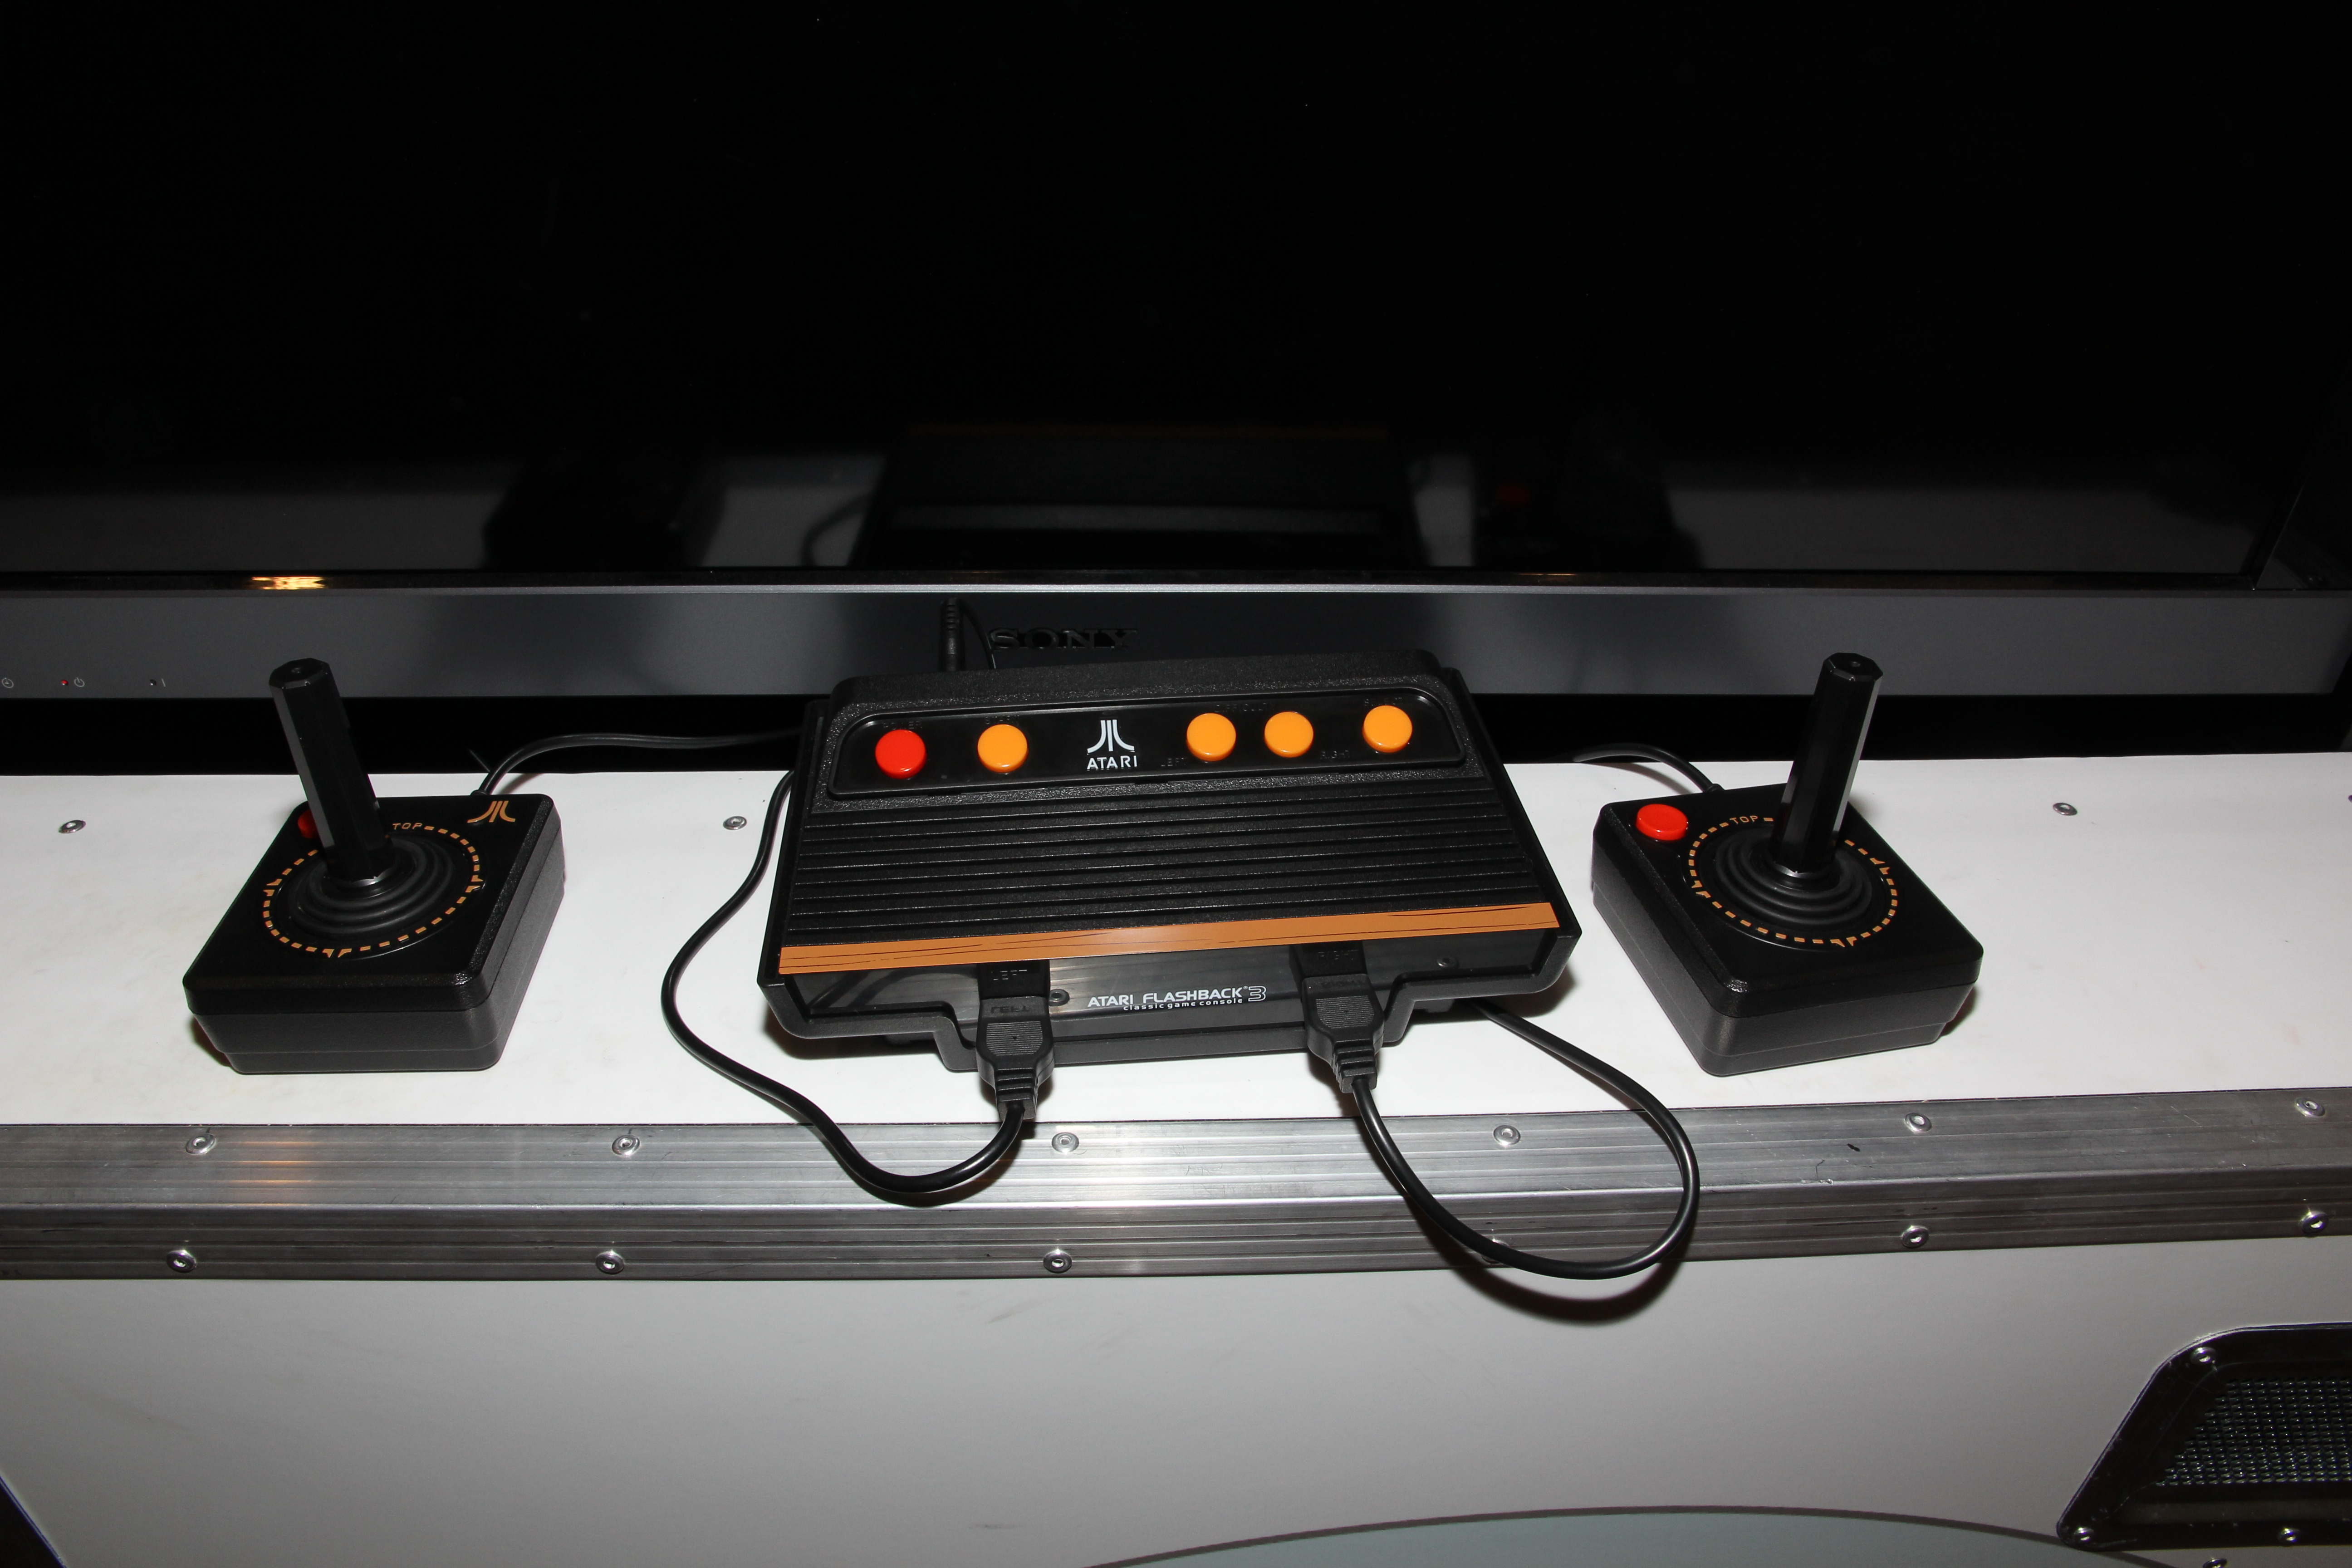 File atari flashback 3 tietokonemuseo jpg wikimedia commons - Atari flashback 3 classic game console ...